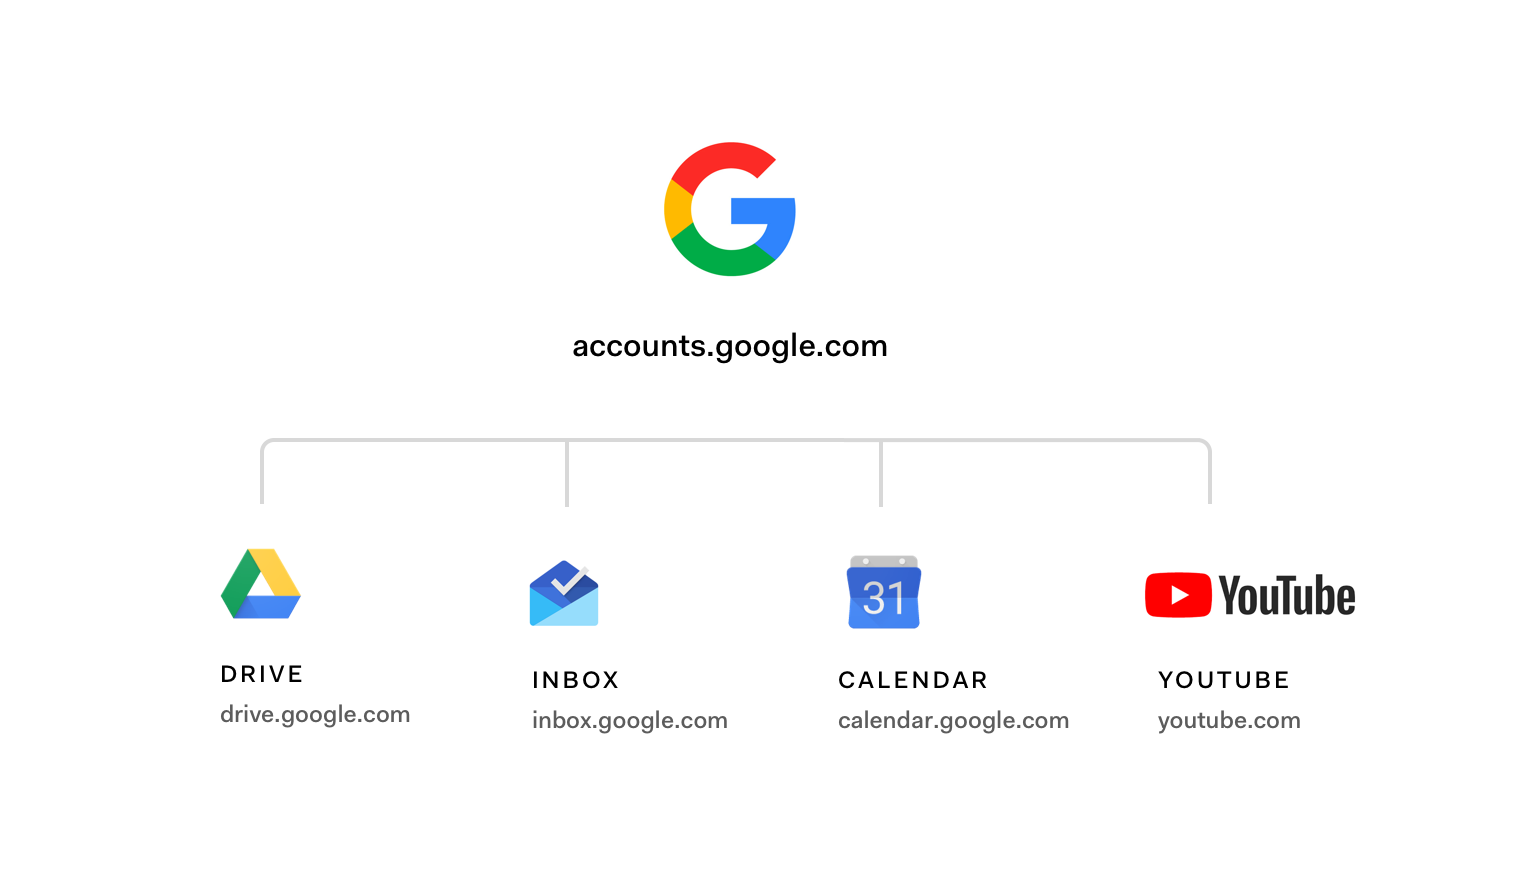 Google central authorization server